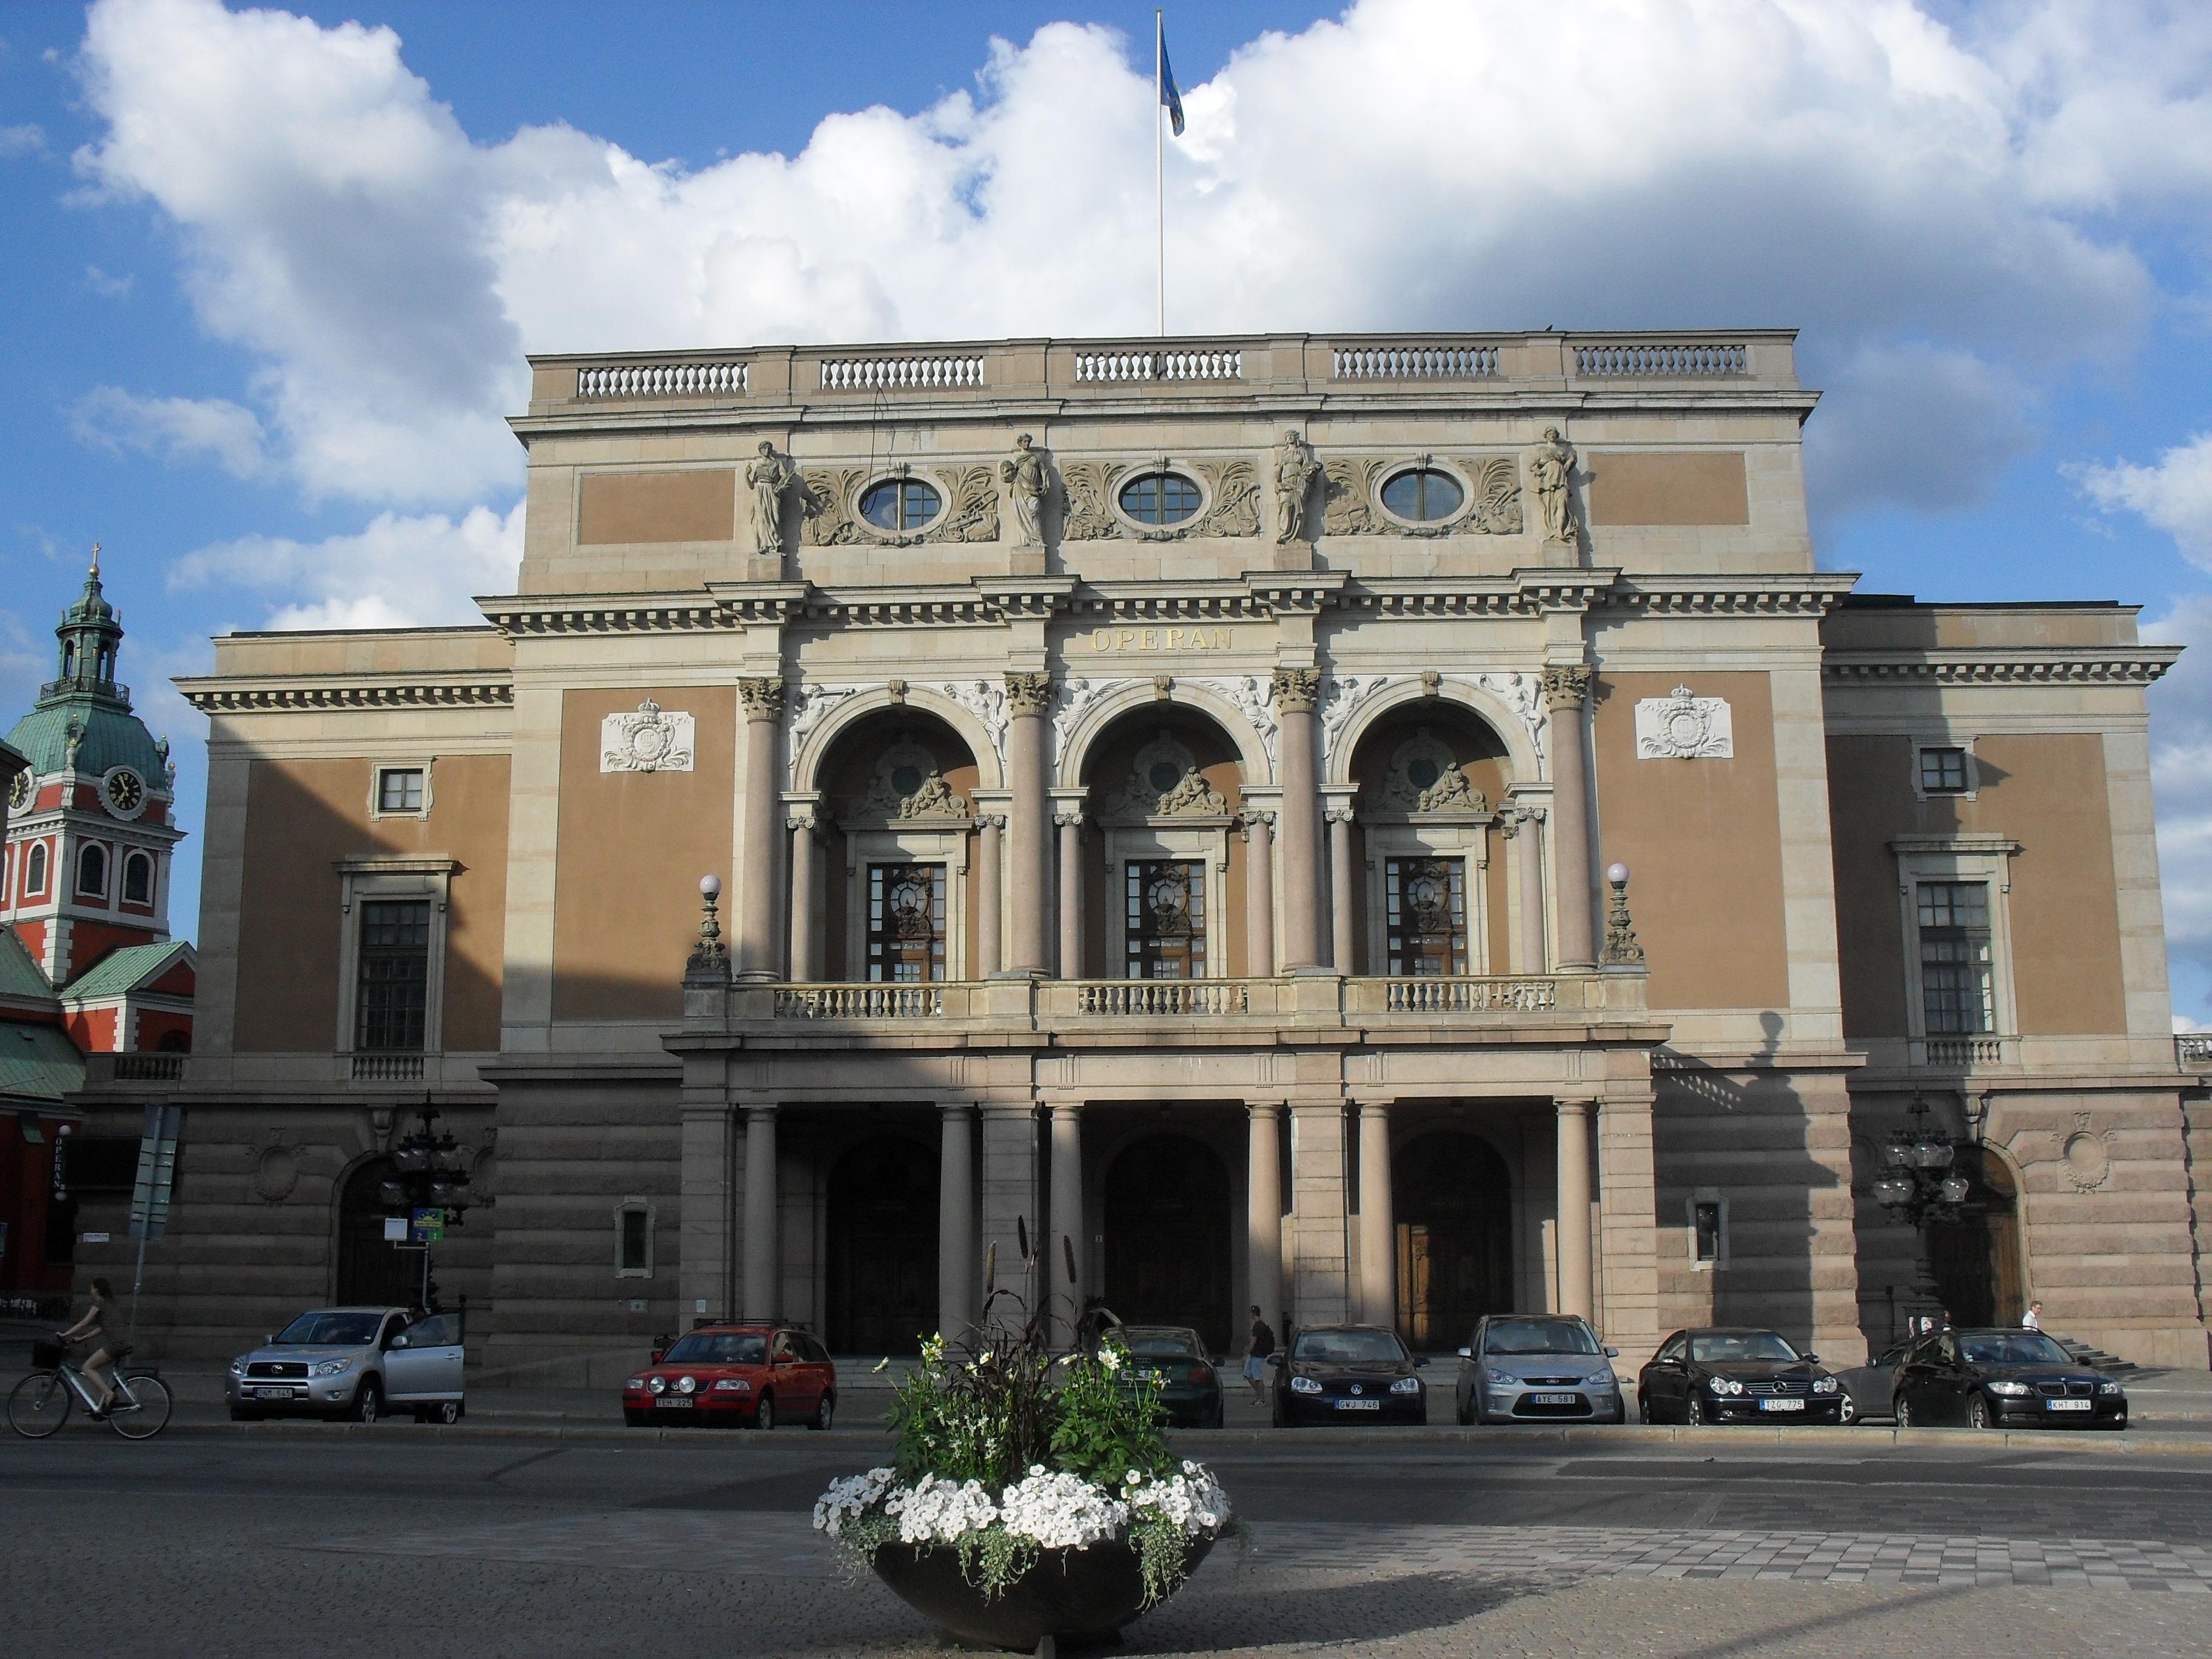 Stockholm Royal Opera